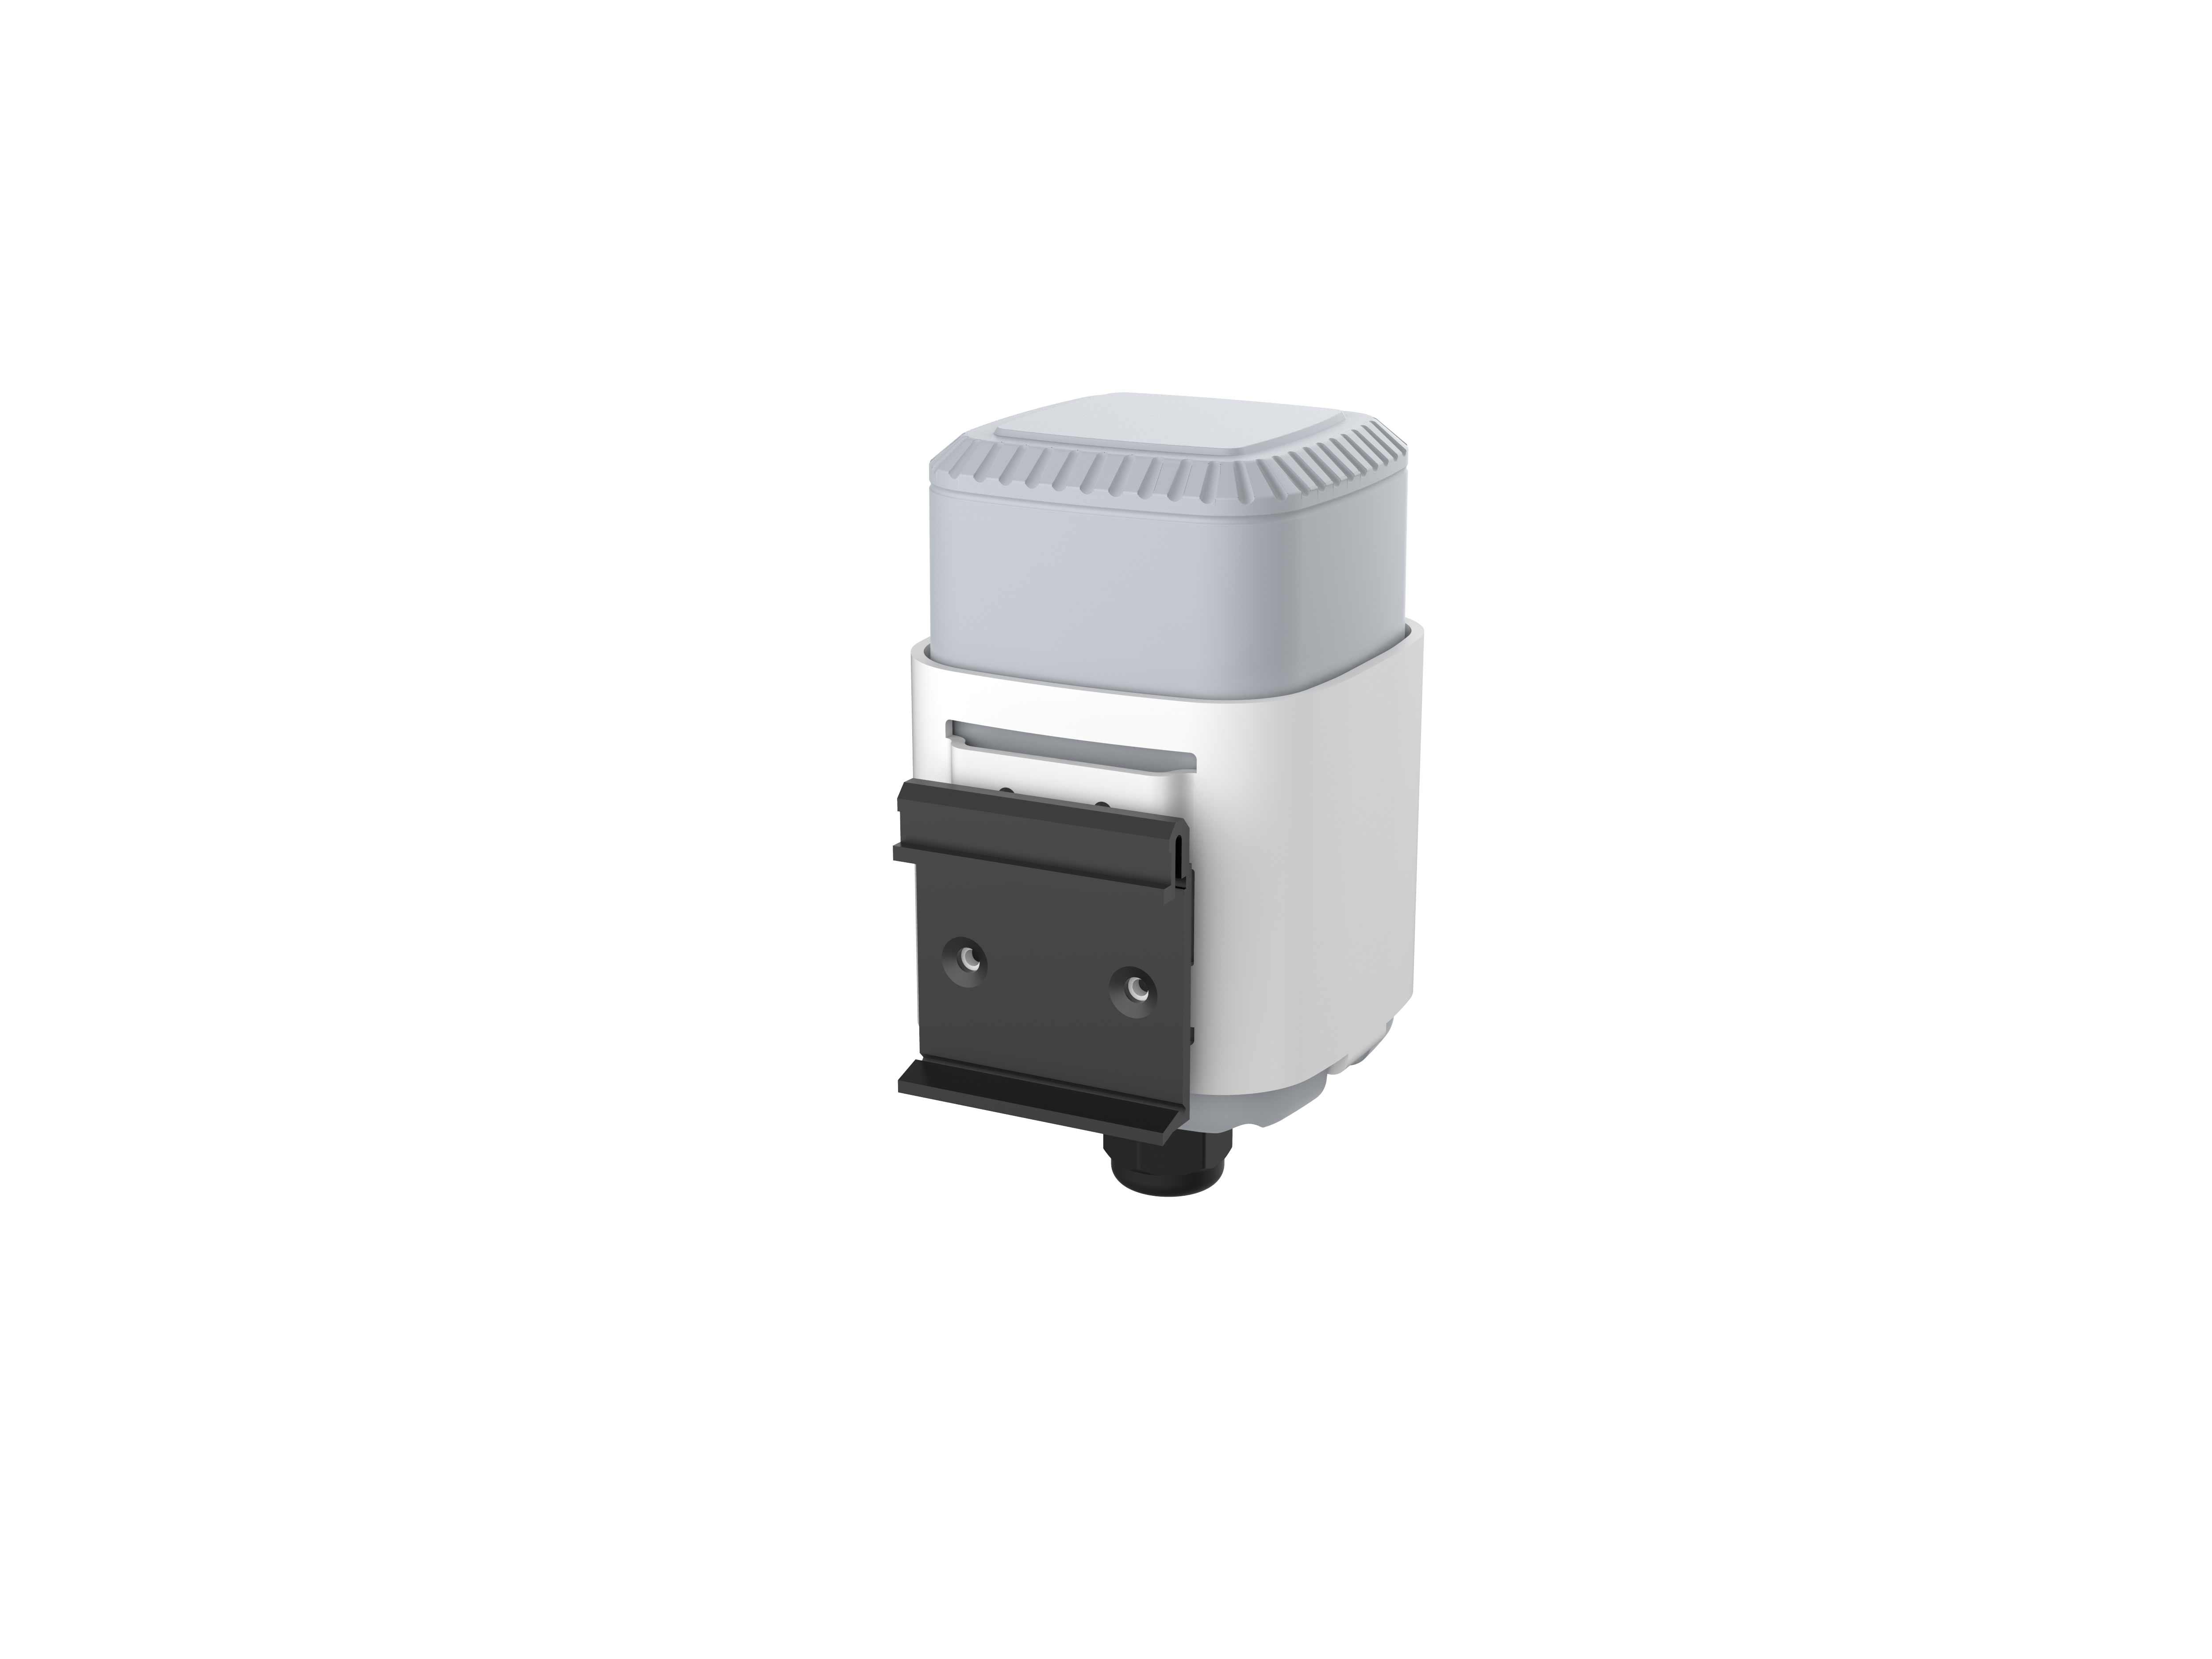 EM500-Ultrasonic-distance-level-sensor-bild buy online at ICPDAS-EUROPE